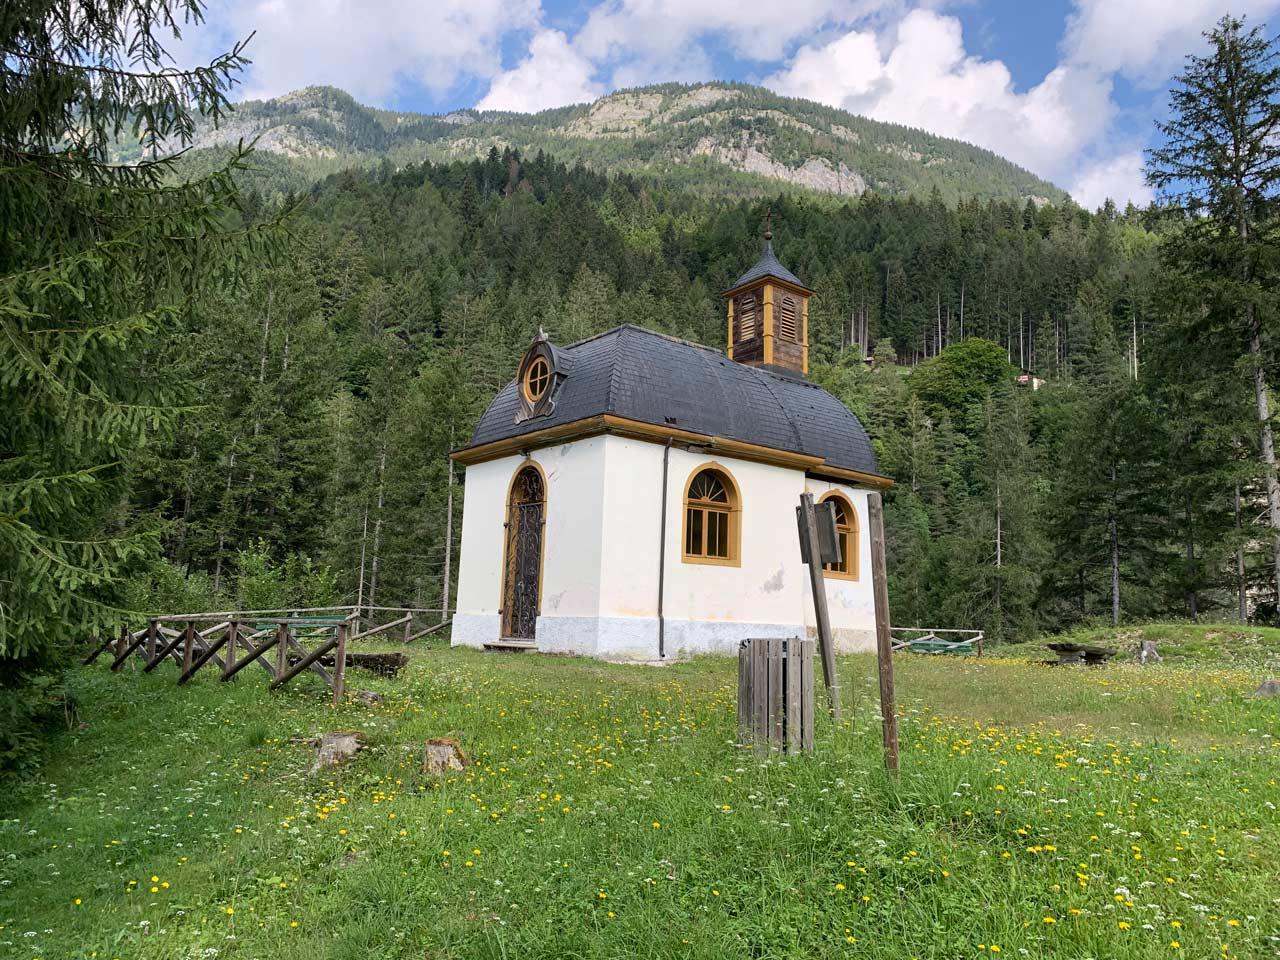 bagni-gogna-auronzo-chiesetta-santa-maria-assunta